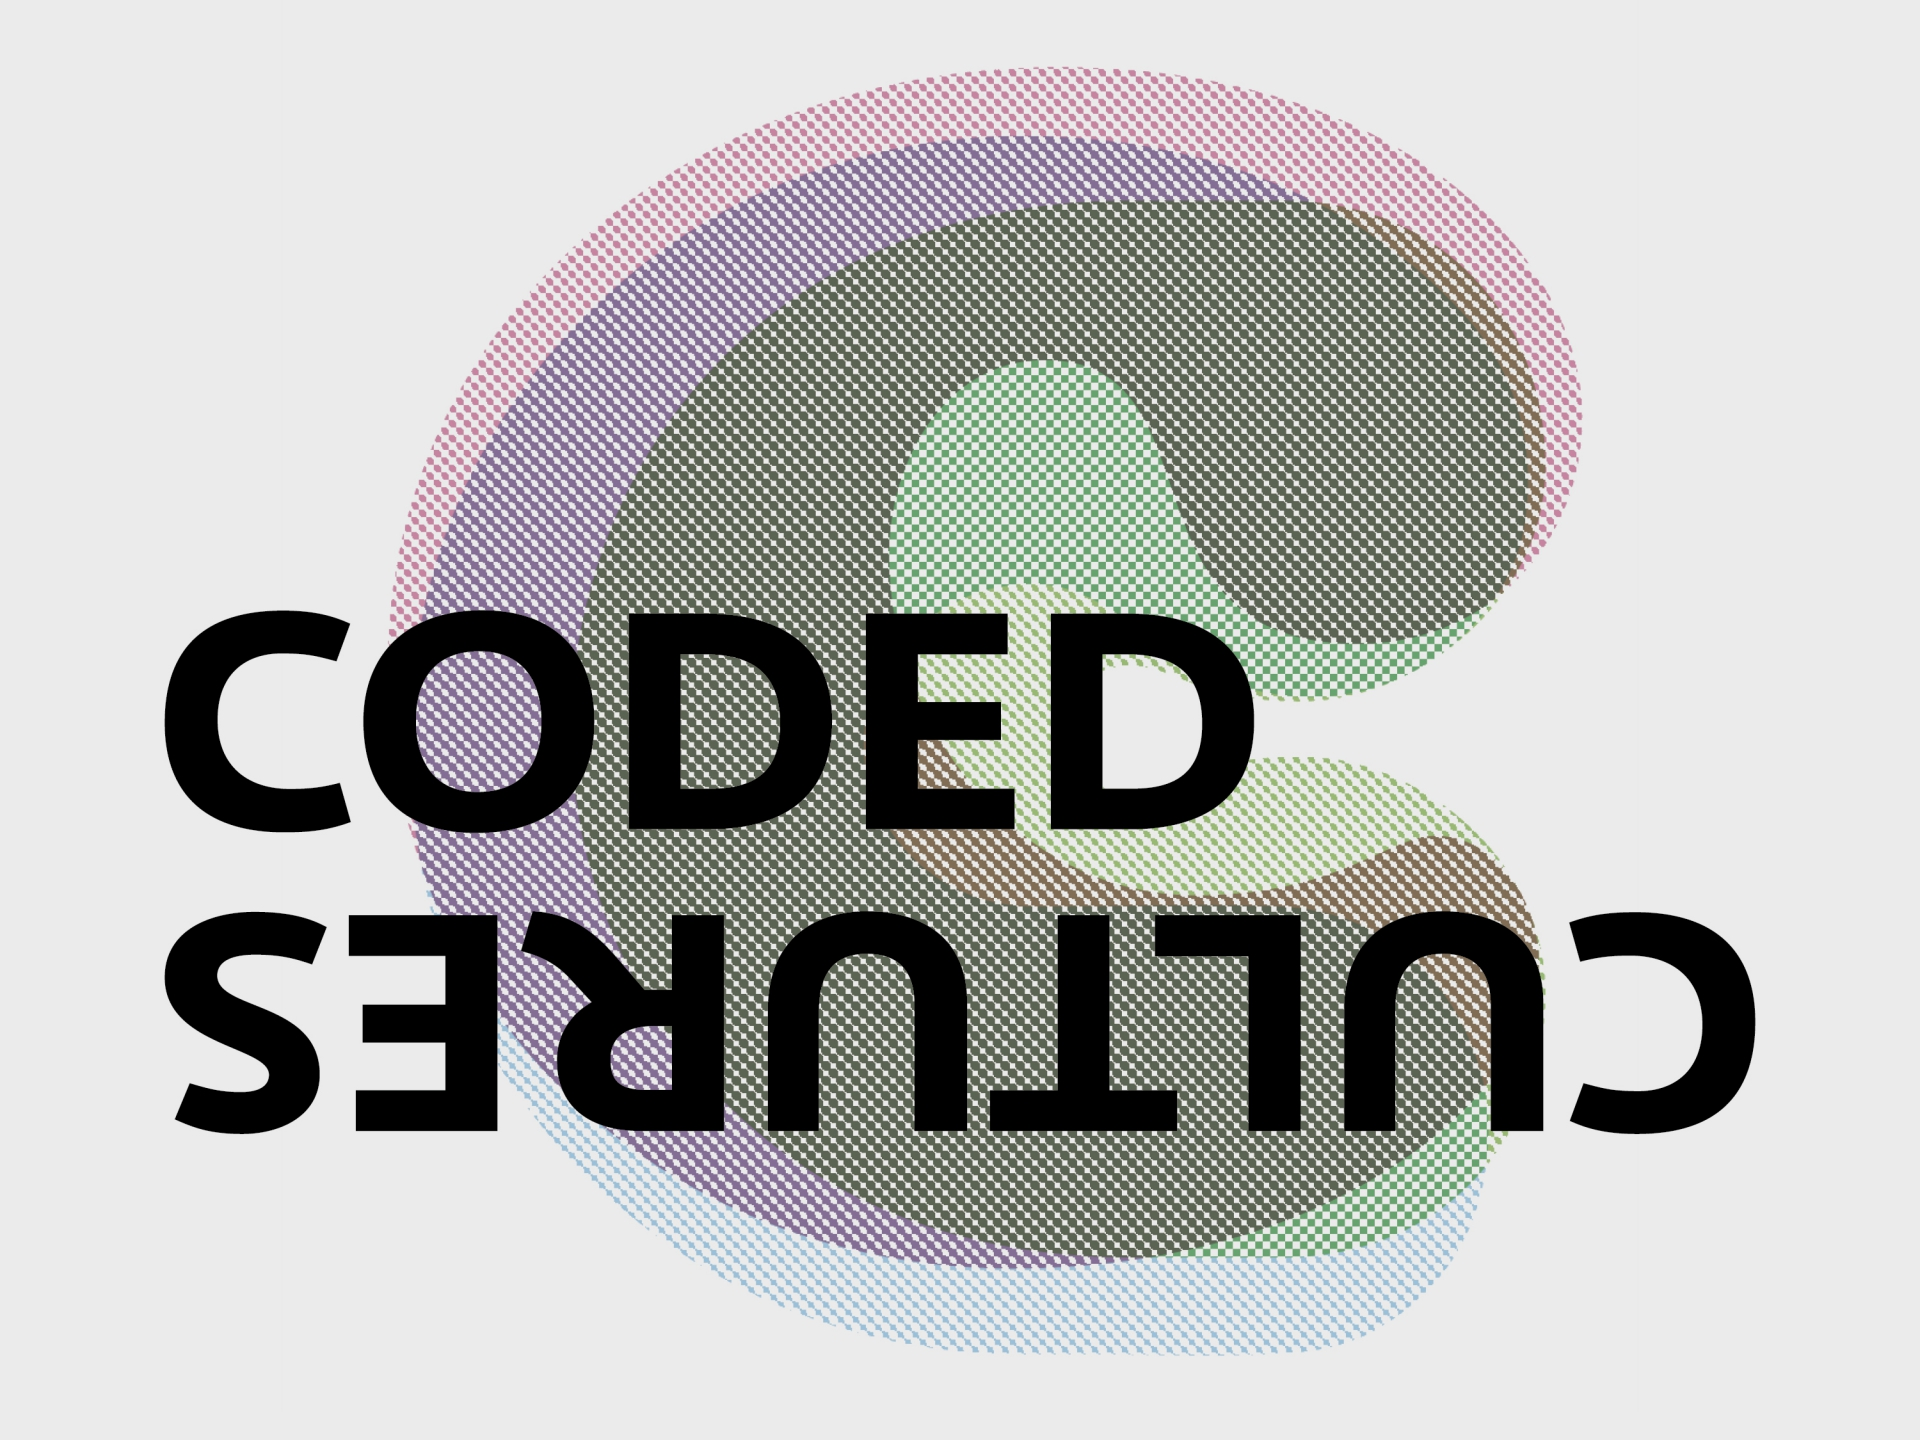 Grafikum Coded Cultures festival